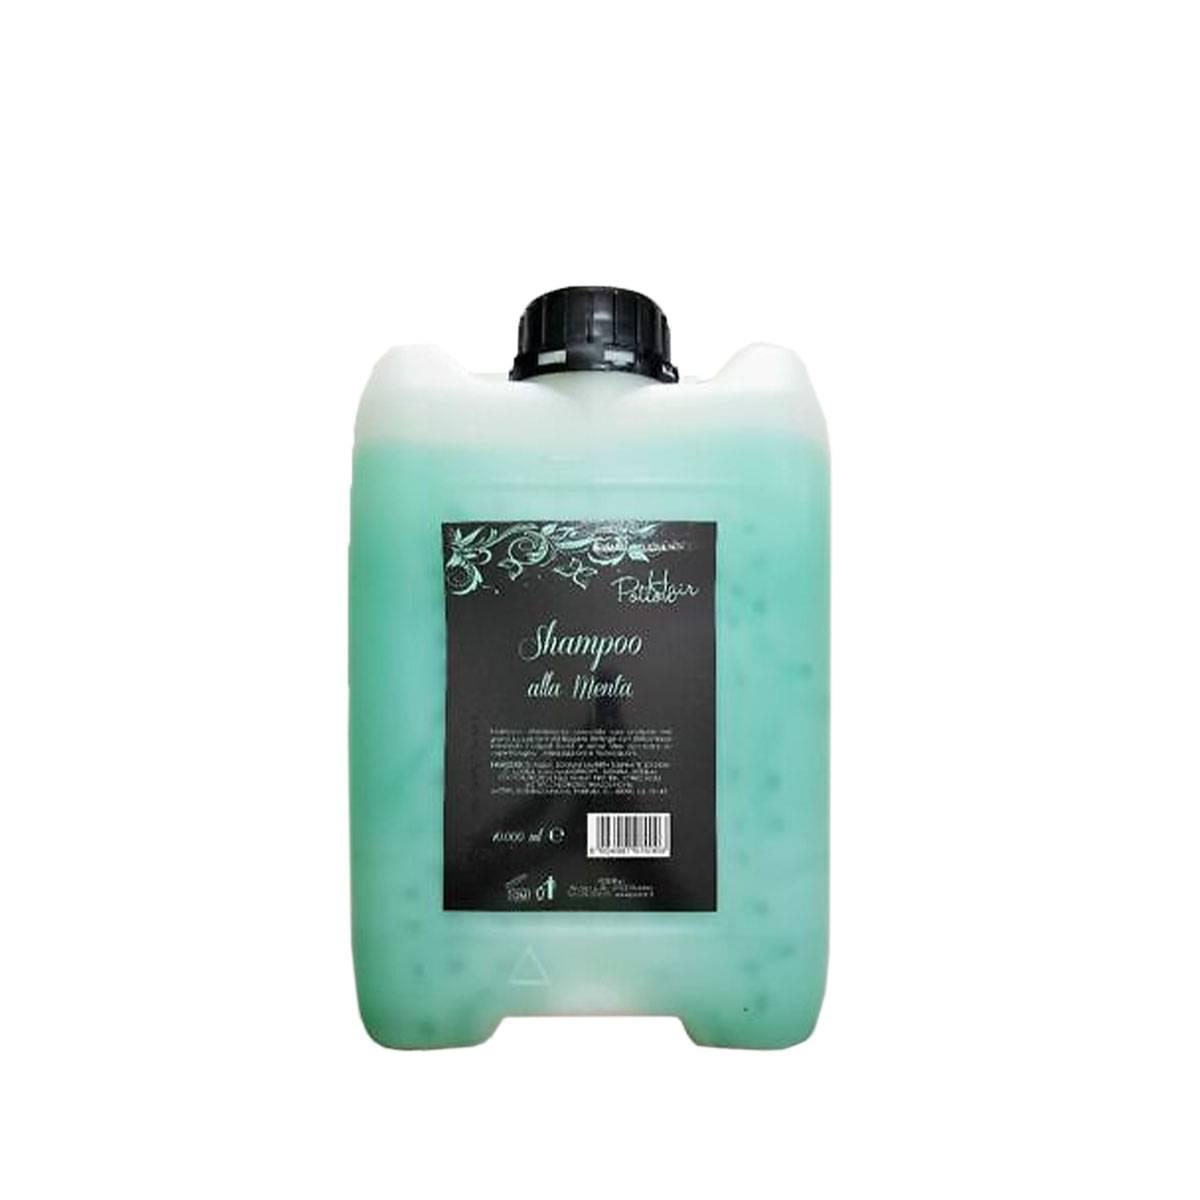 Seta shampoo tanica 10l menta SHAMPOO